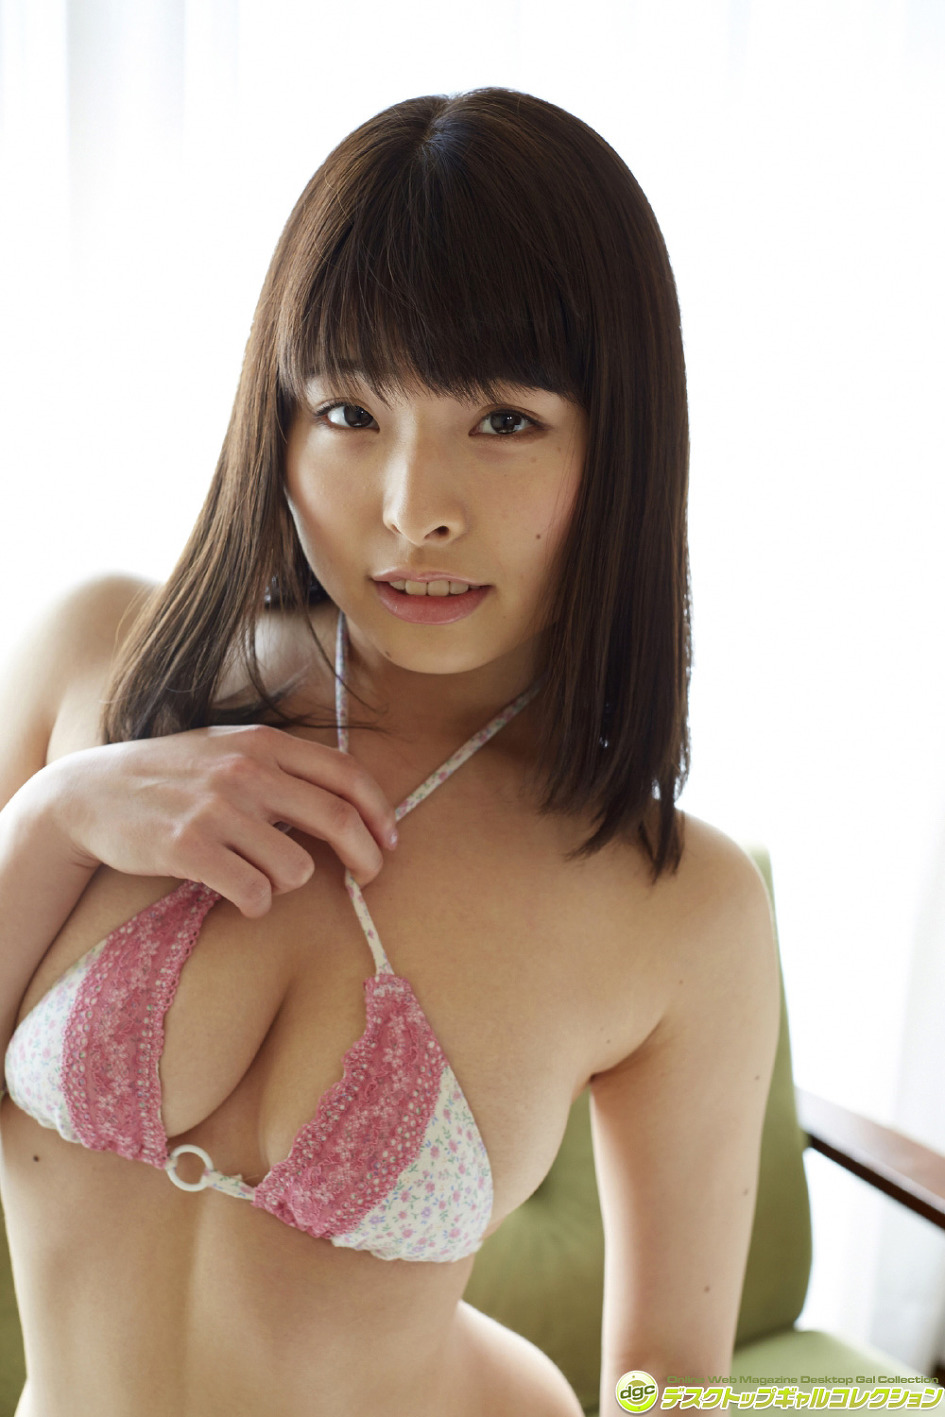 Tachibana Emiri 立花絵海莉